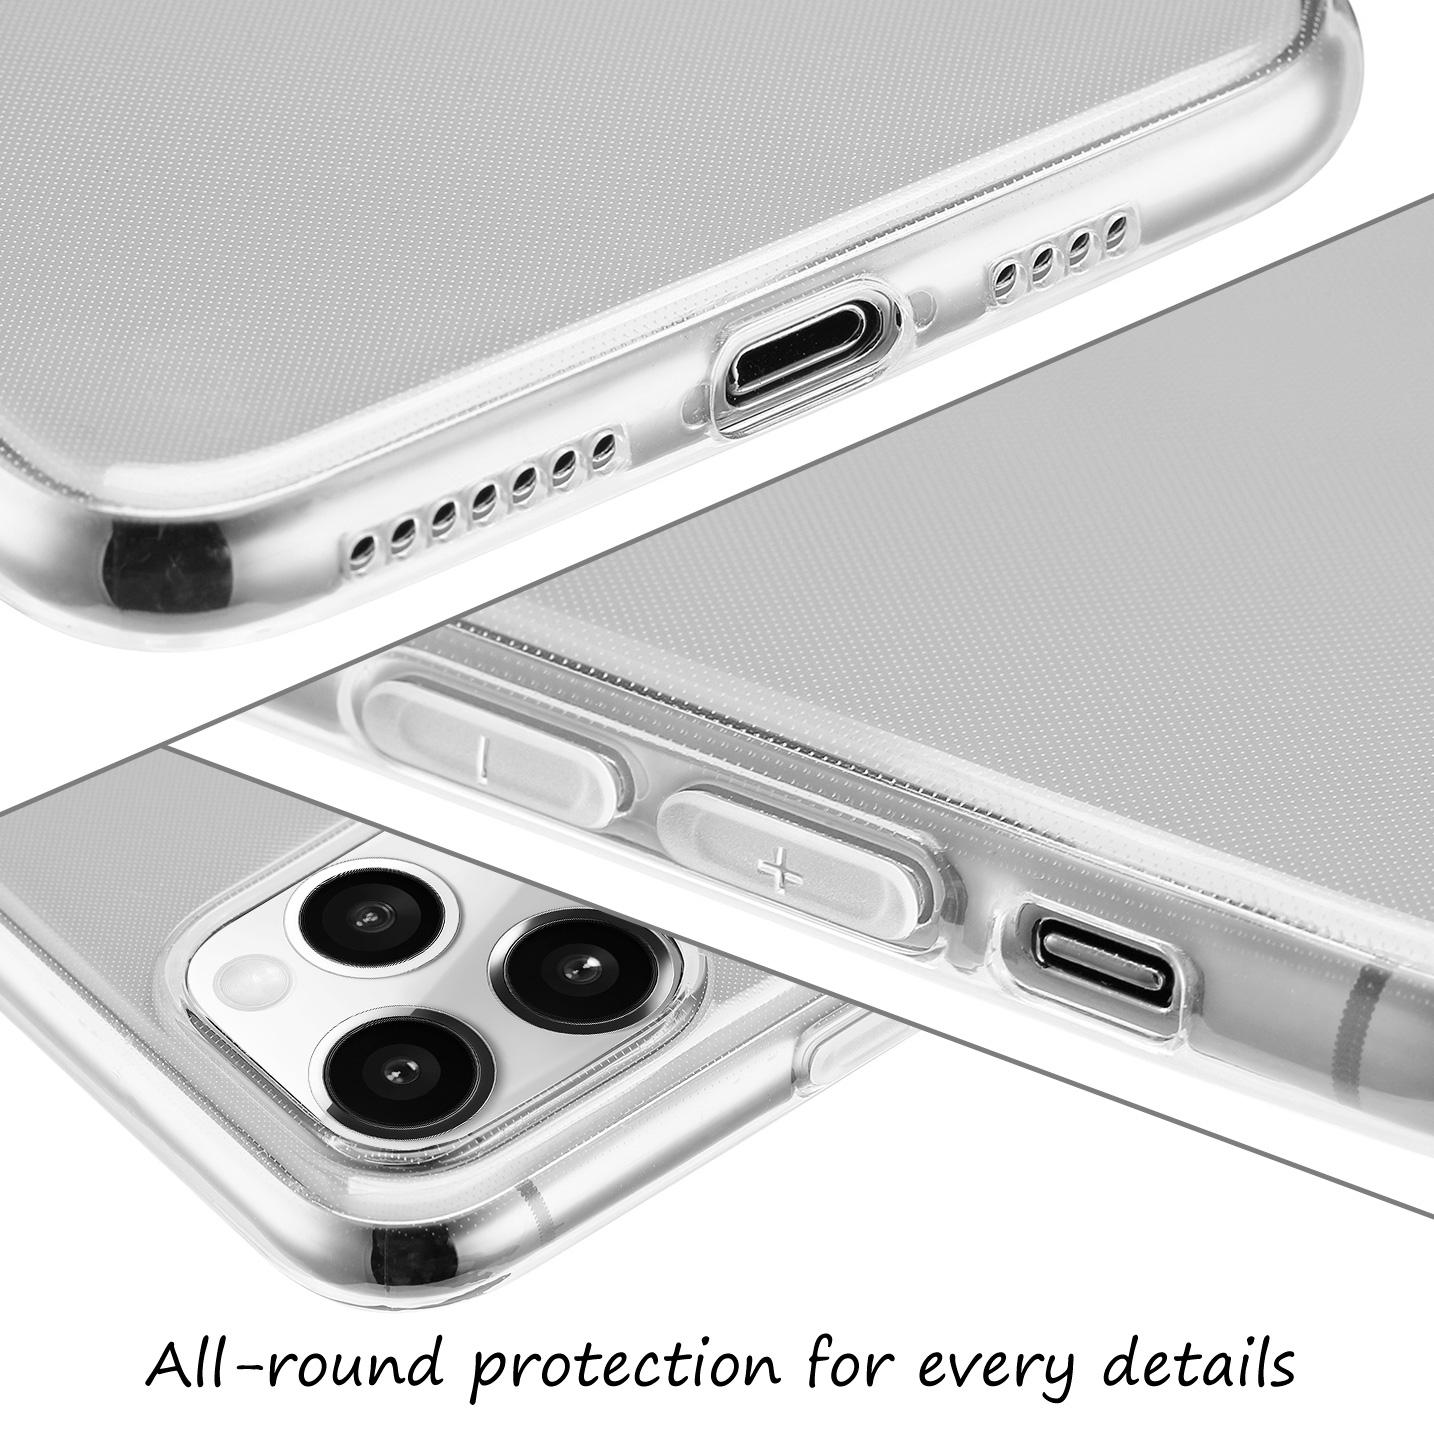 Ultra-Slim-Case-iPhone-11-Pro-5-8-034-Matt-Clear-Schutz-Huelle-Skin-Cover-Etui-Folie Indexbild 52